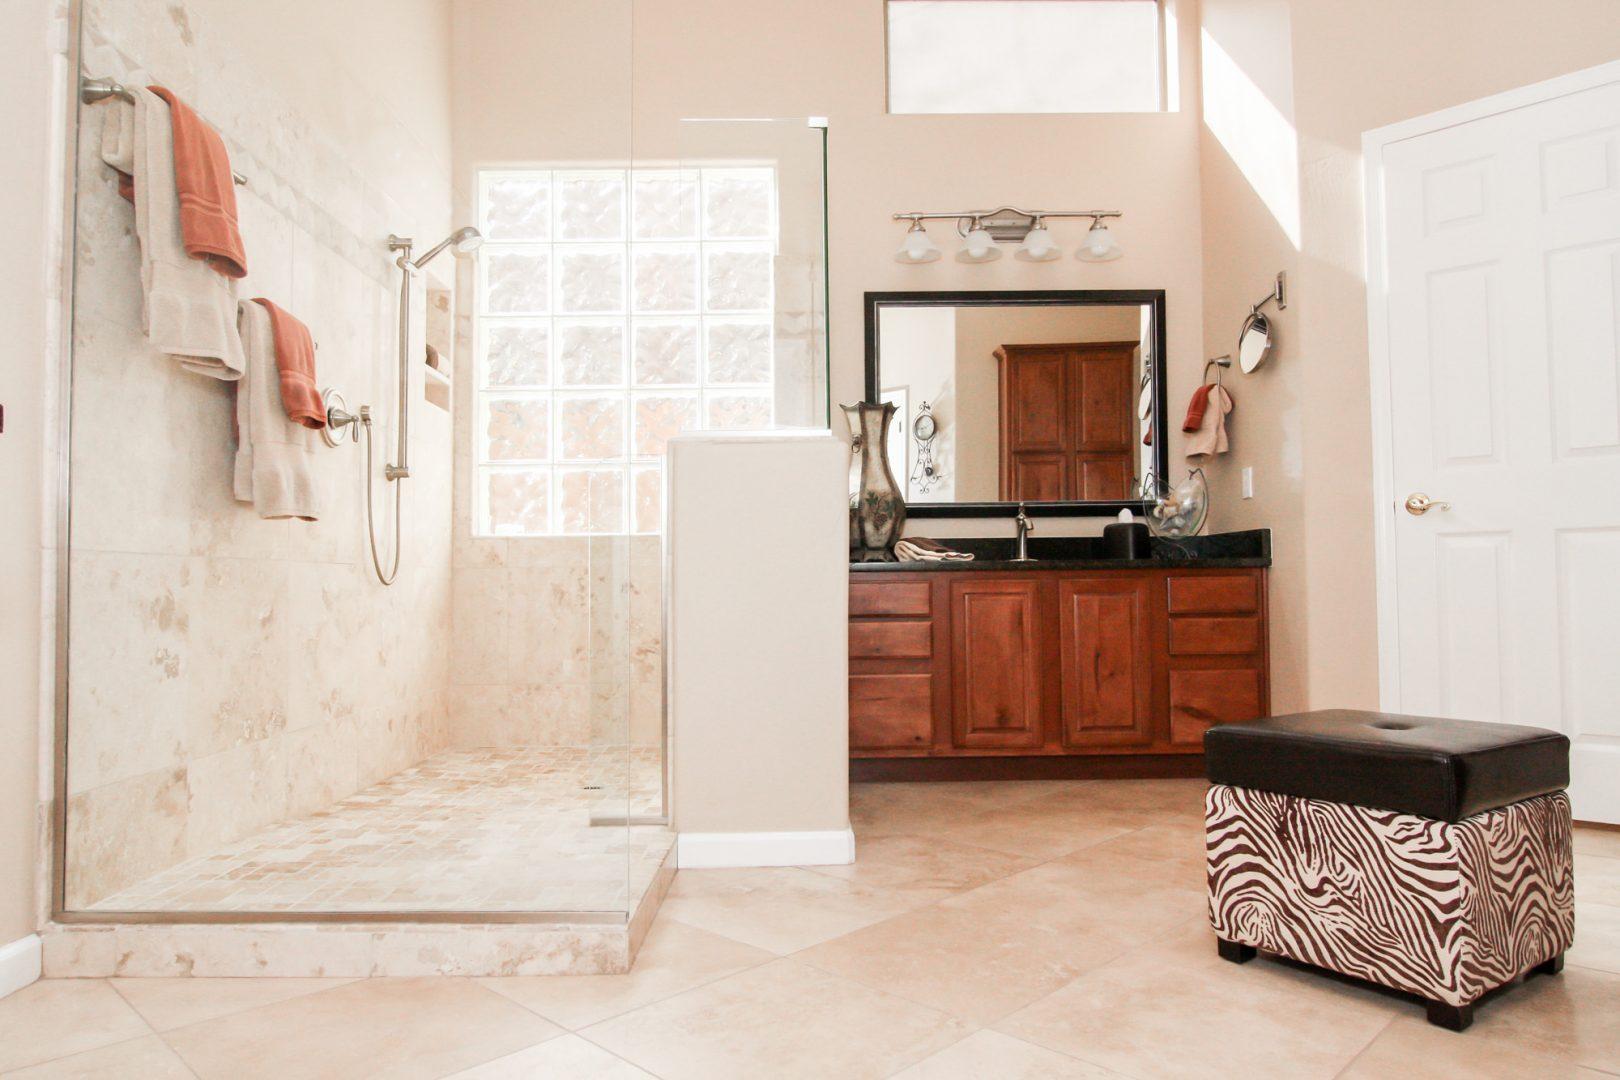 Dreaming of a Spa Bathroom